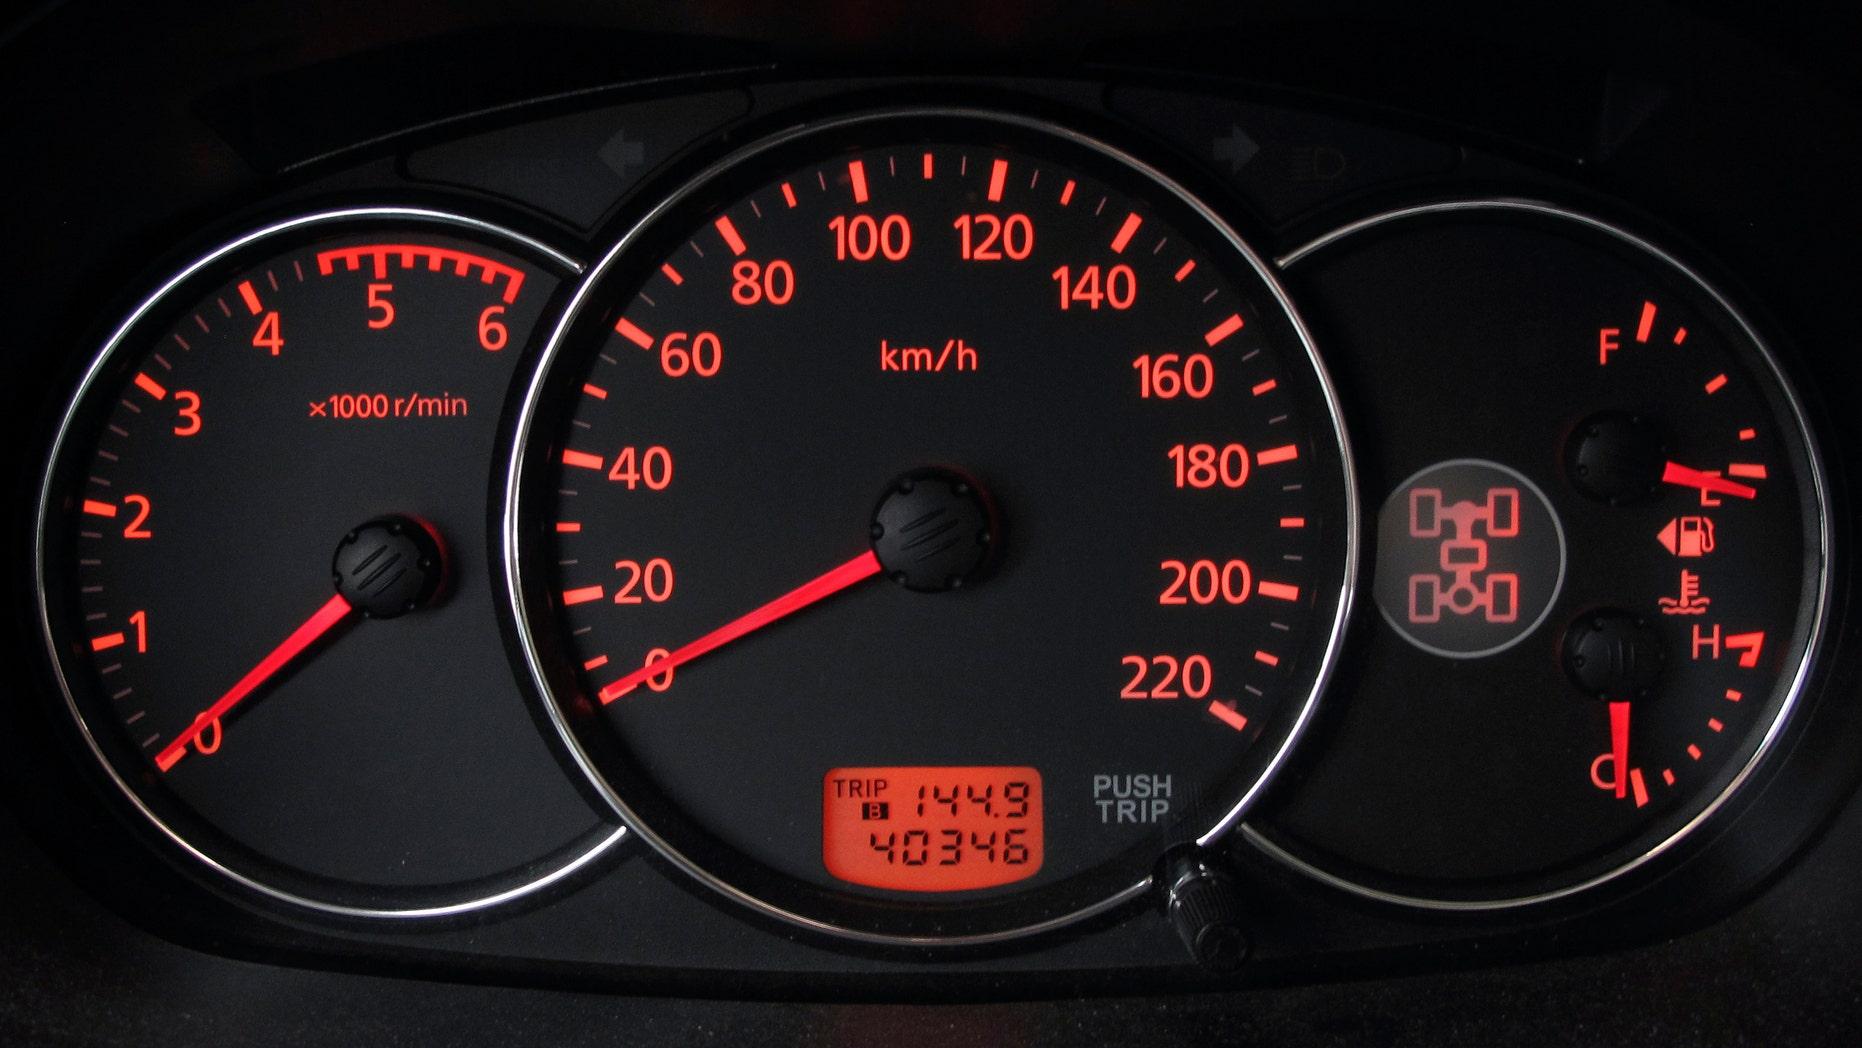 The dashboard of a Mitsubishi Pajero sport is seen in Kiev, March 2, 2012.   REUTERS/Gleb Garanich (UKRAINE  - Tags: TRANSPORT)   - RTR2YR15